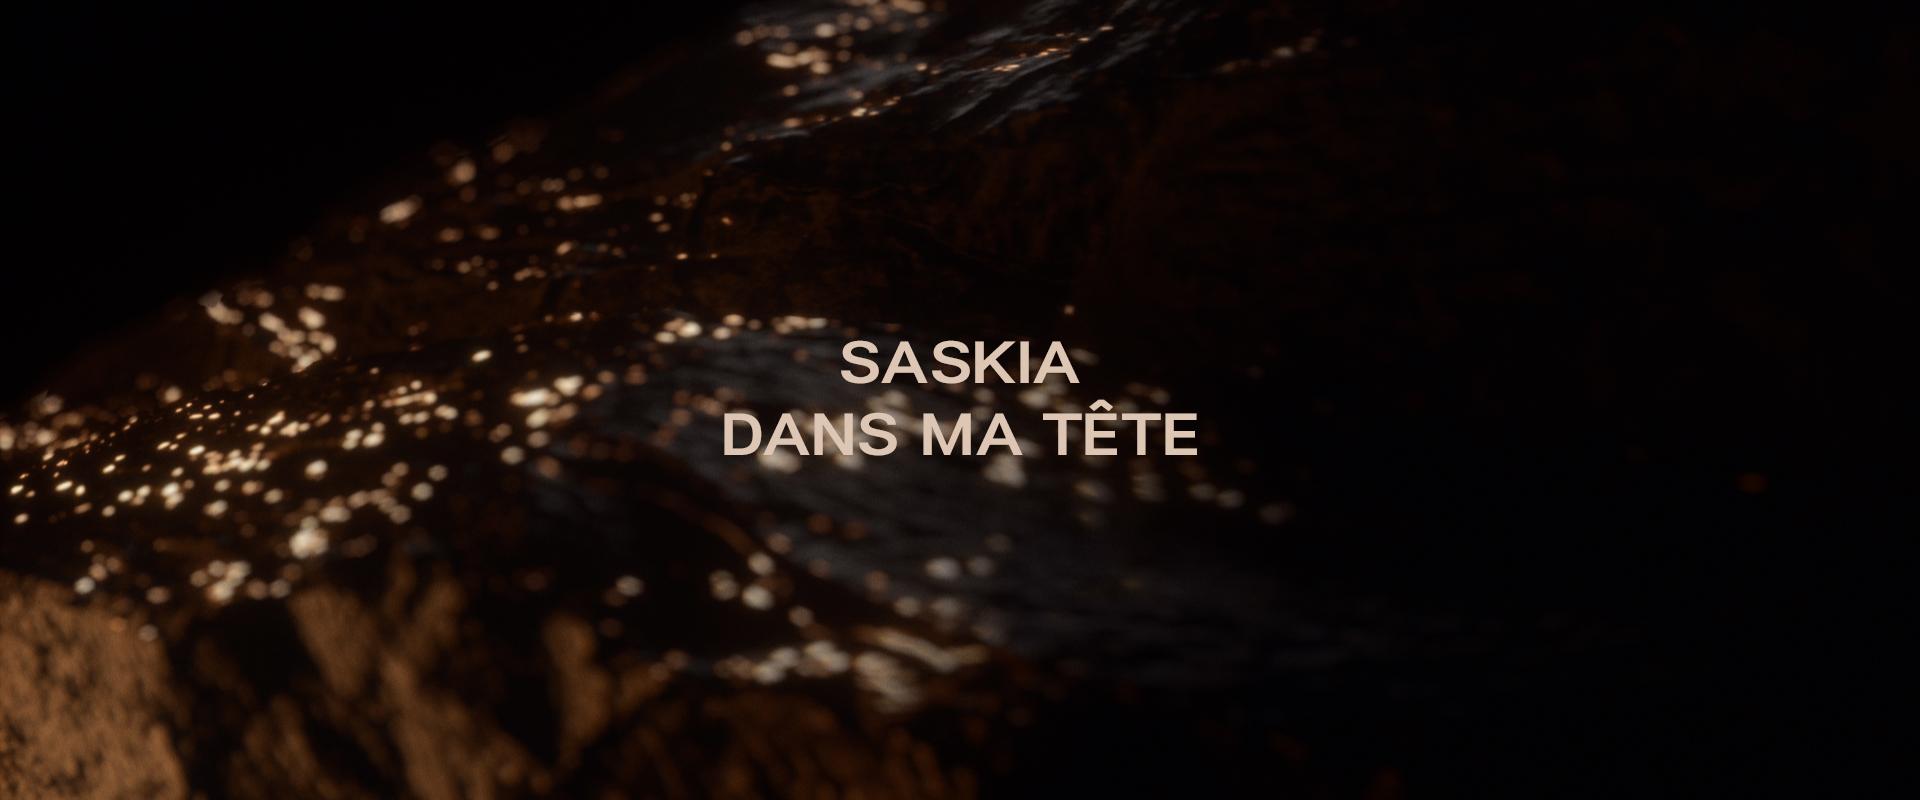 Dans ma tête - Saskia